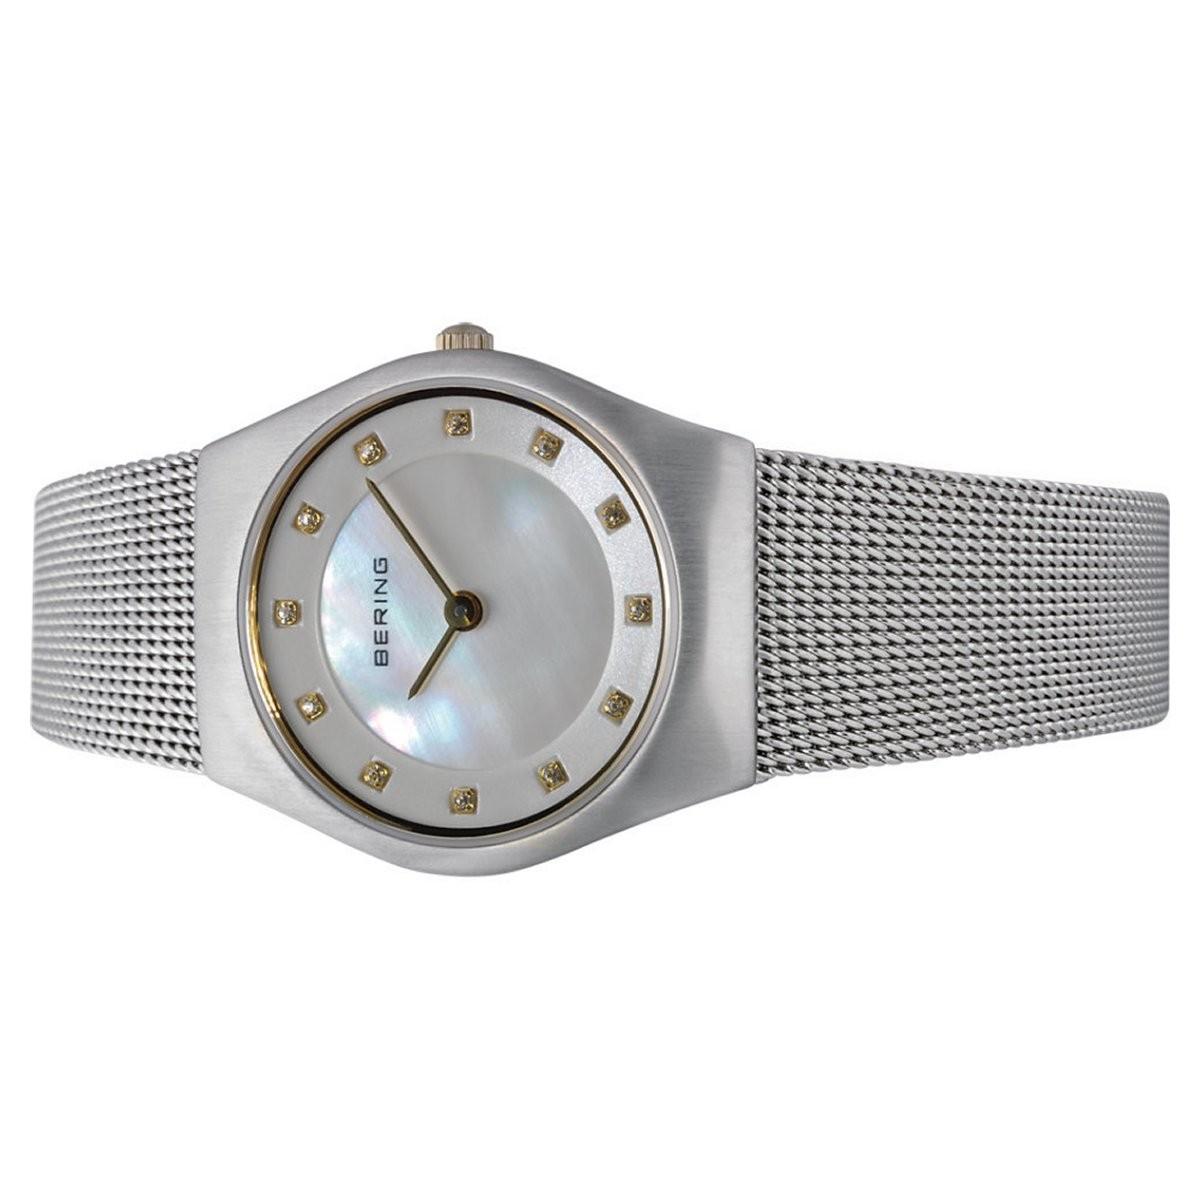 004 Damen Meshband Slim Bering Armbanduhr Classic Uhr 11927 ikZwOuPXT